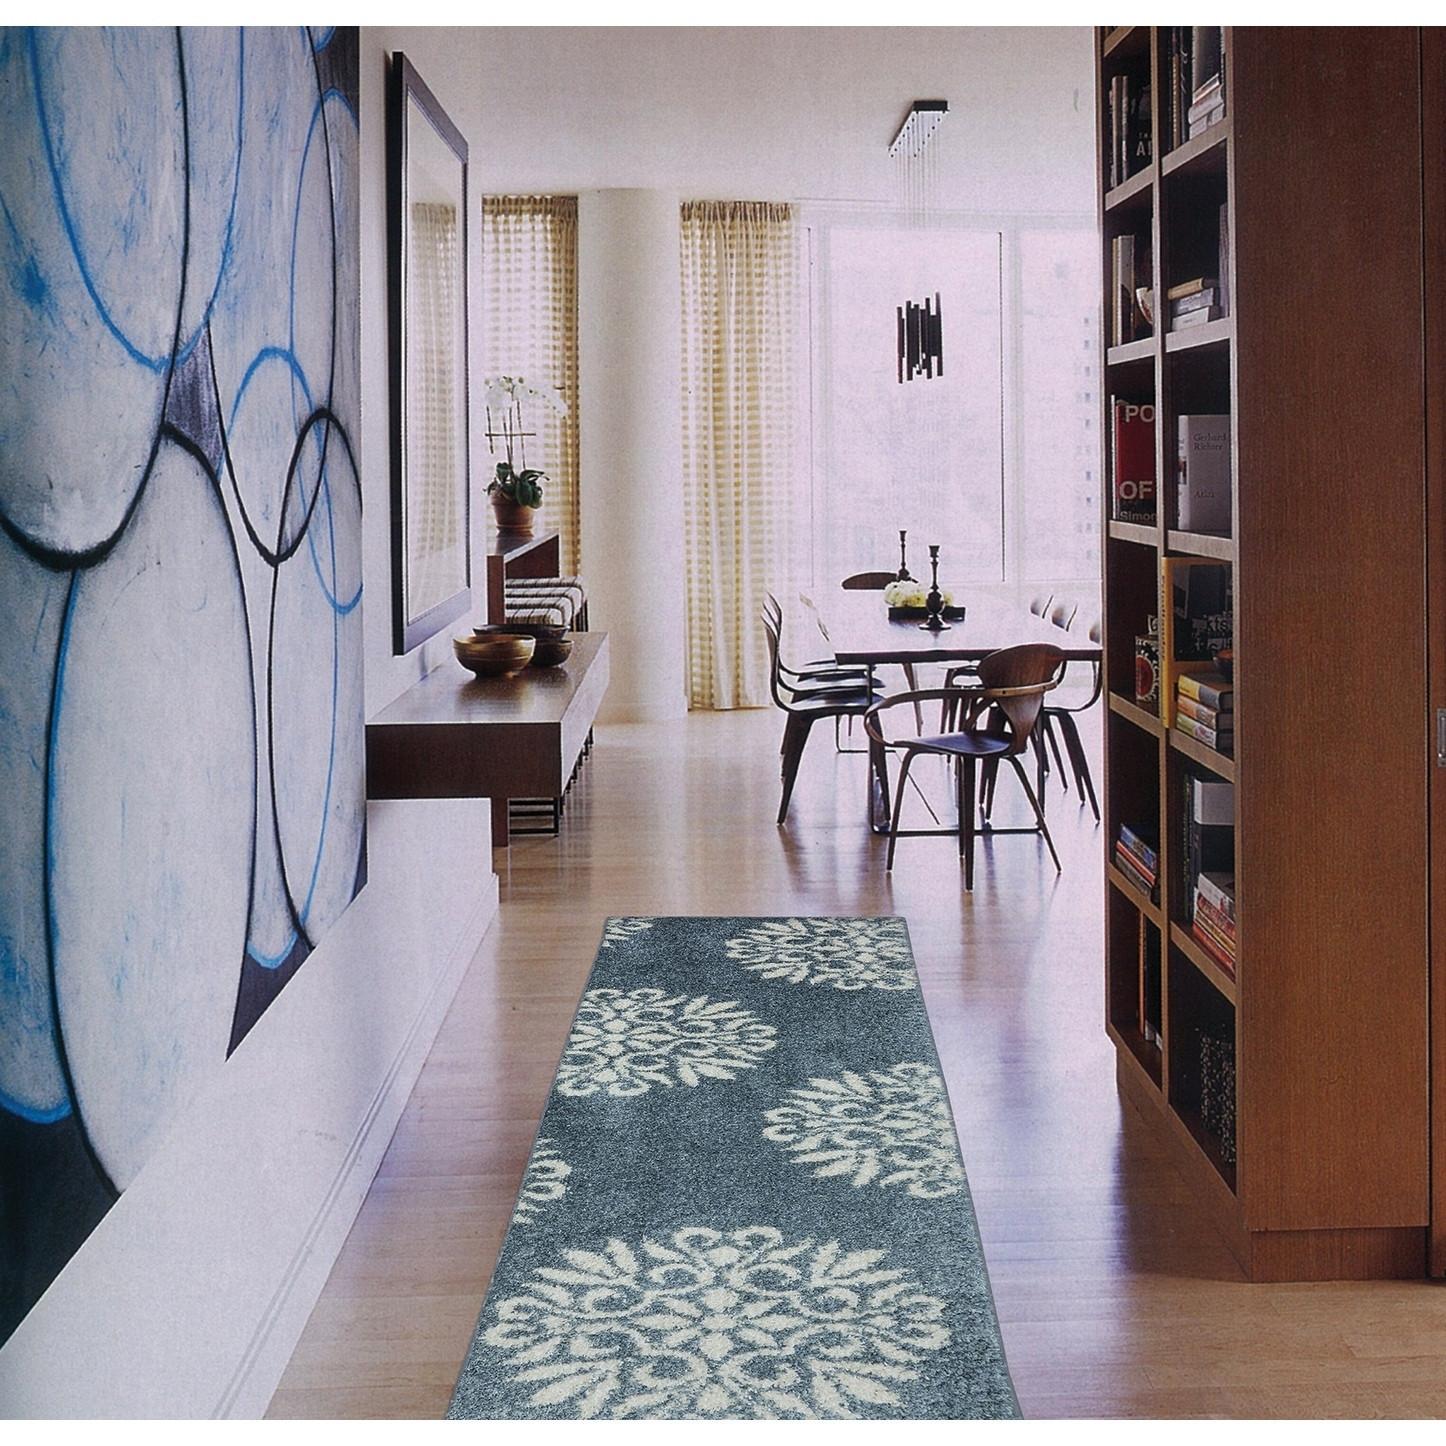 hardwood floors in bedroom or carpet of grey living room rug unique 36 best rug ideas for bedroom bedroom intended for grey living room rug inspirational 30 unique floral rugs for living room of grey living room